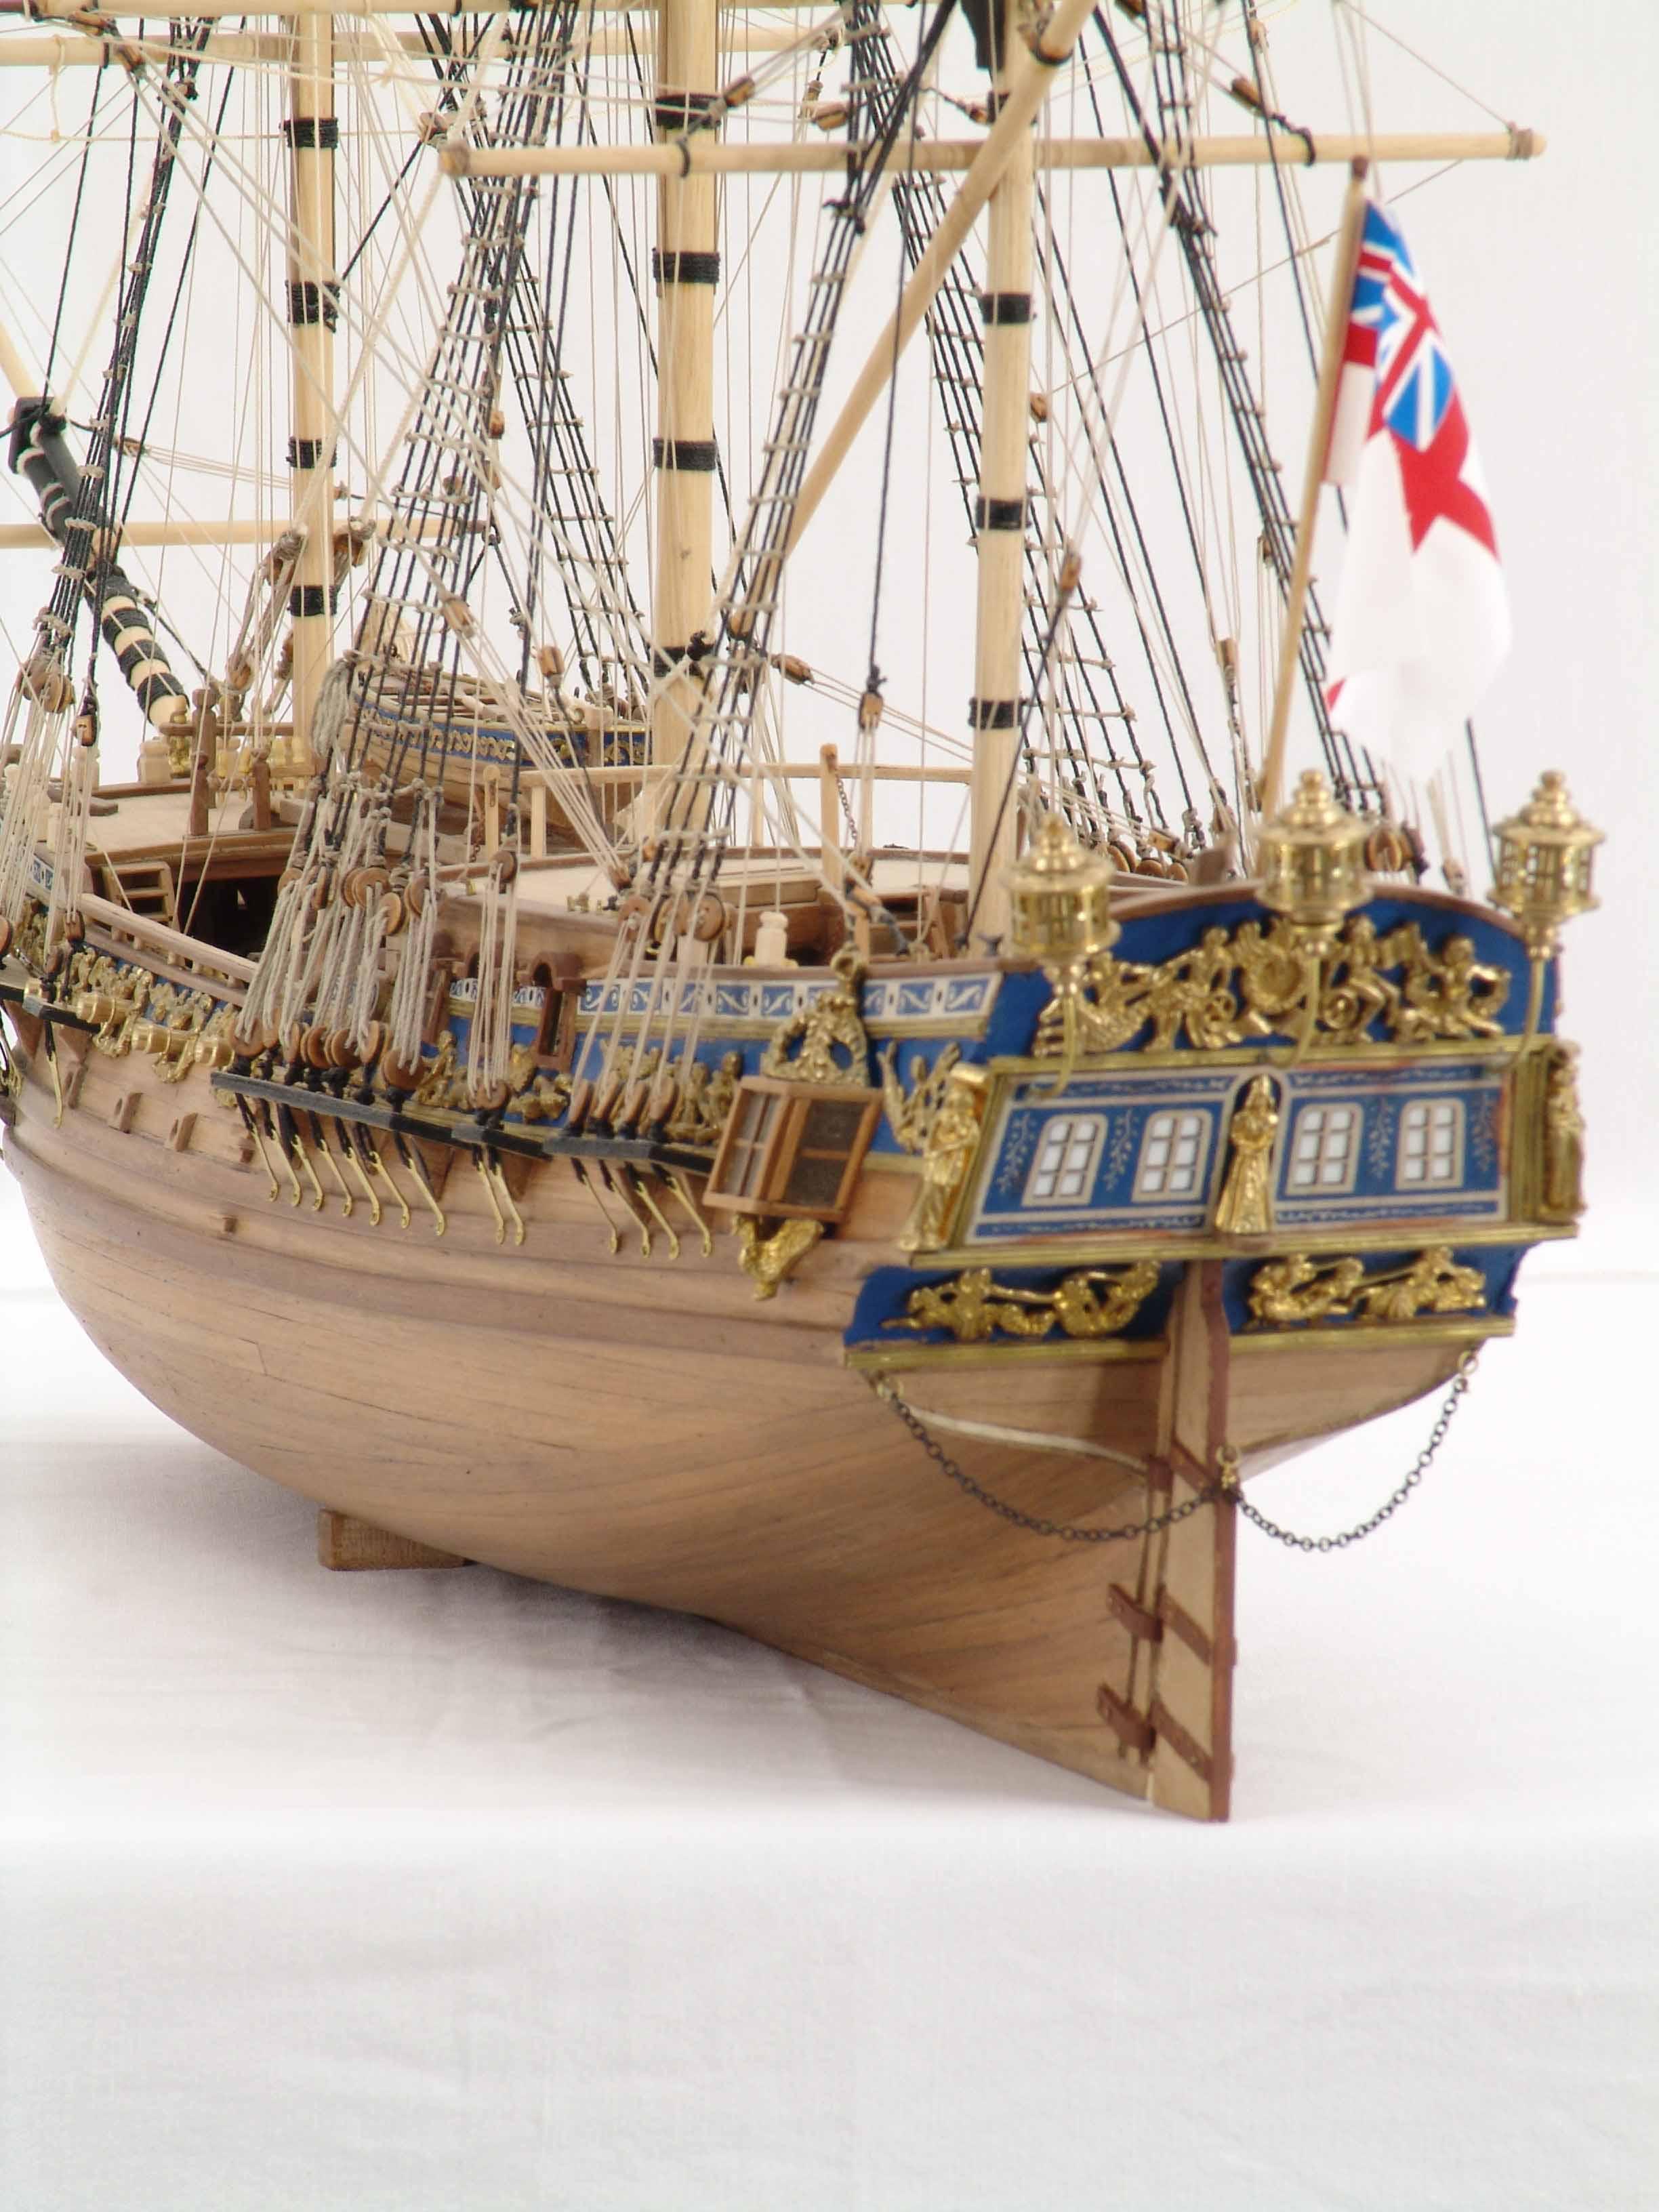 Photos ship model Royal Caroline, details